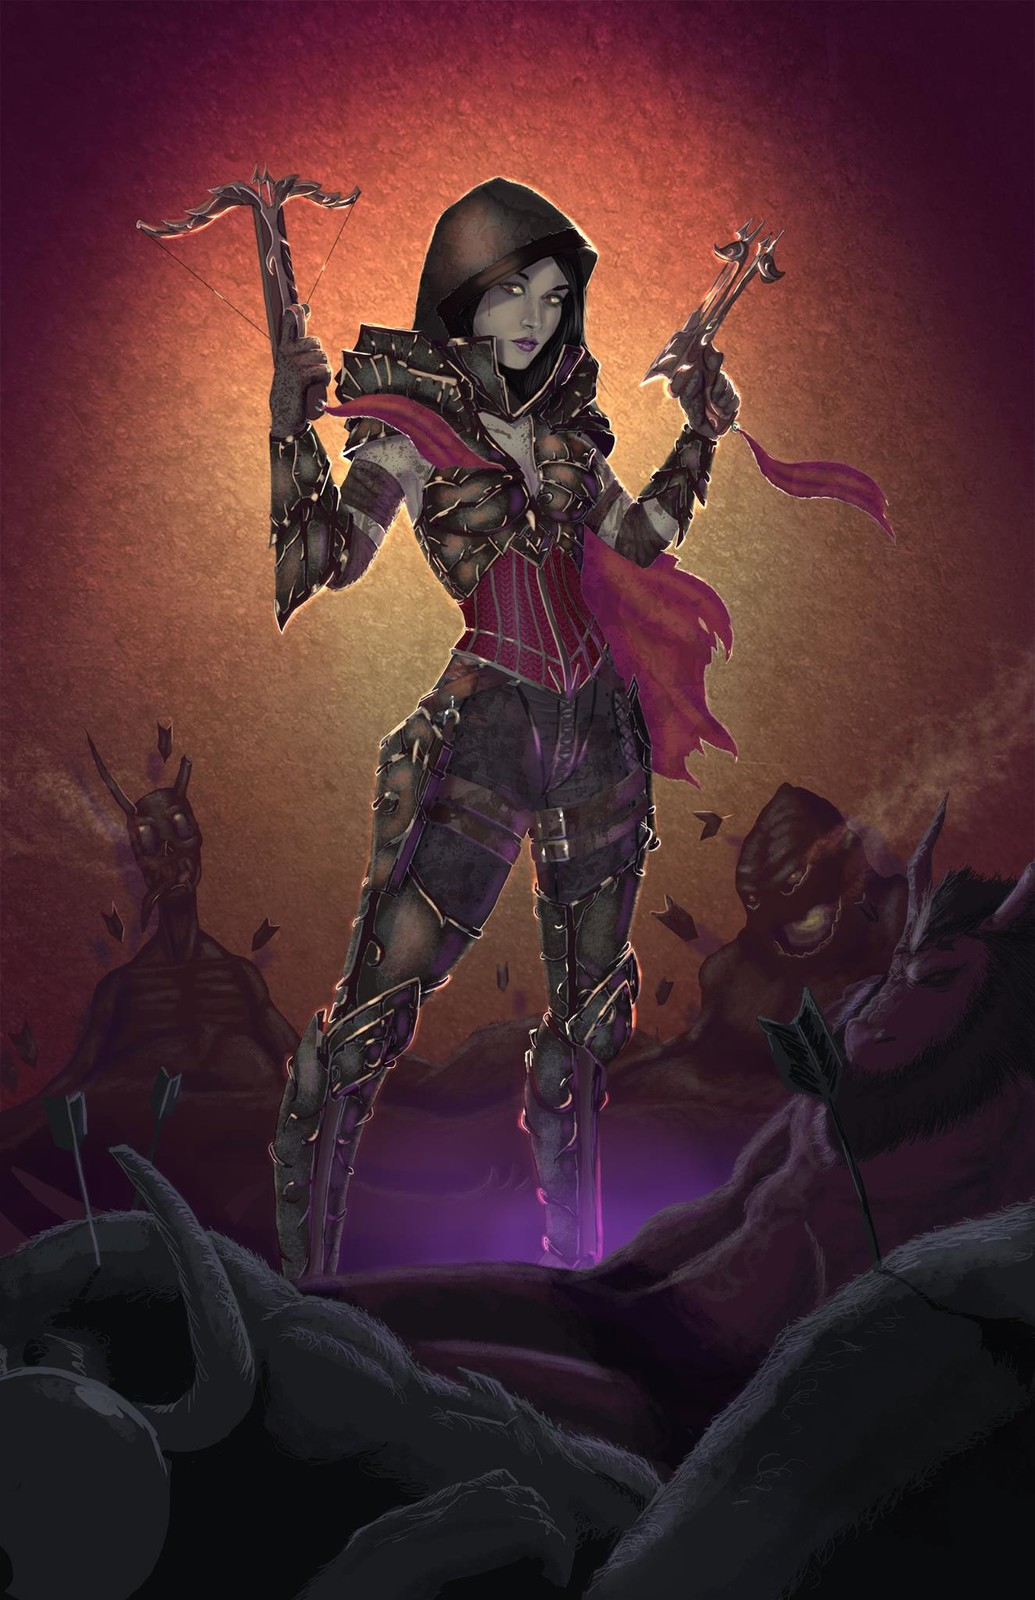 Demon Hunter painting based off of Diablo 3